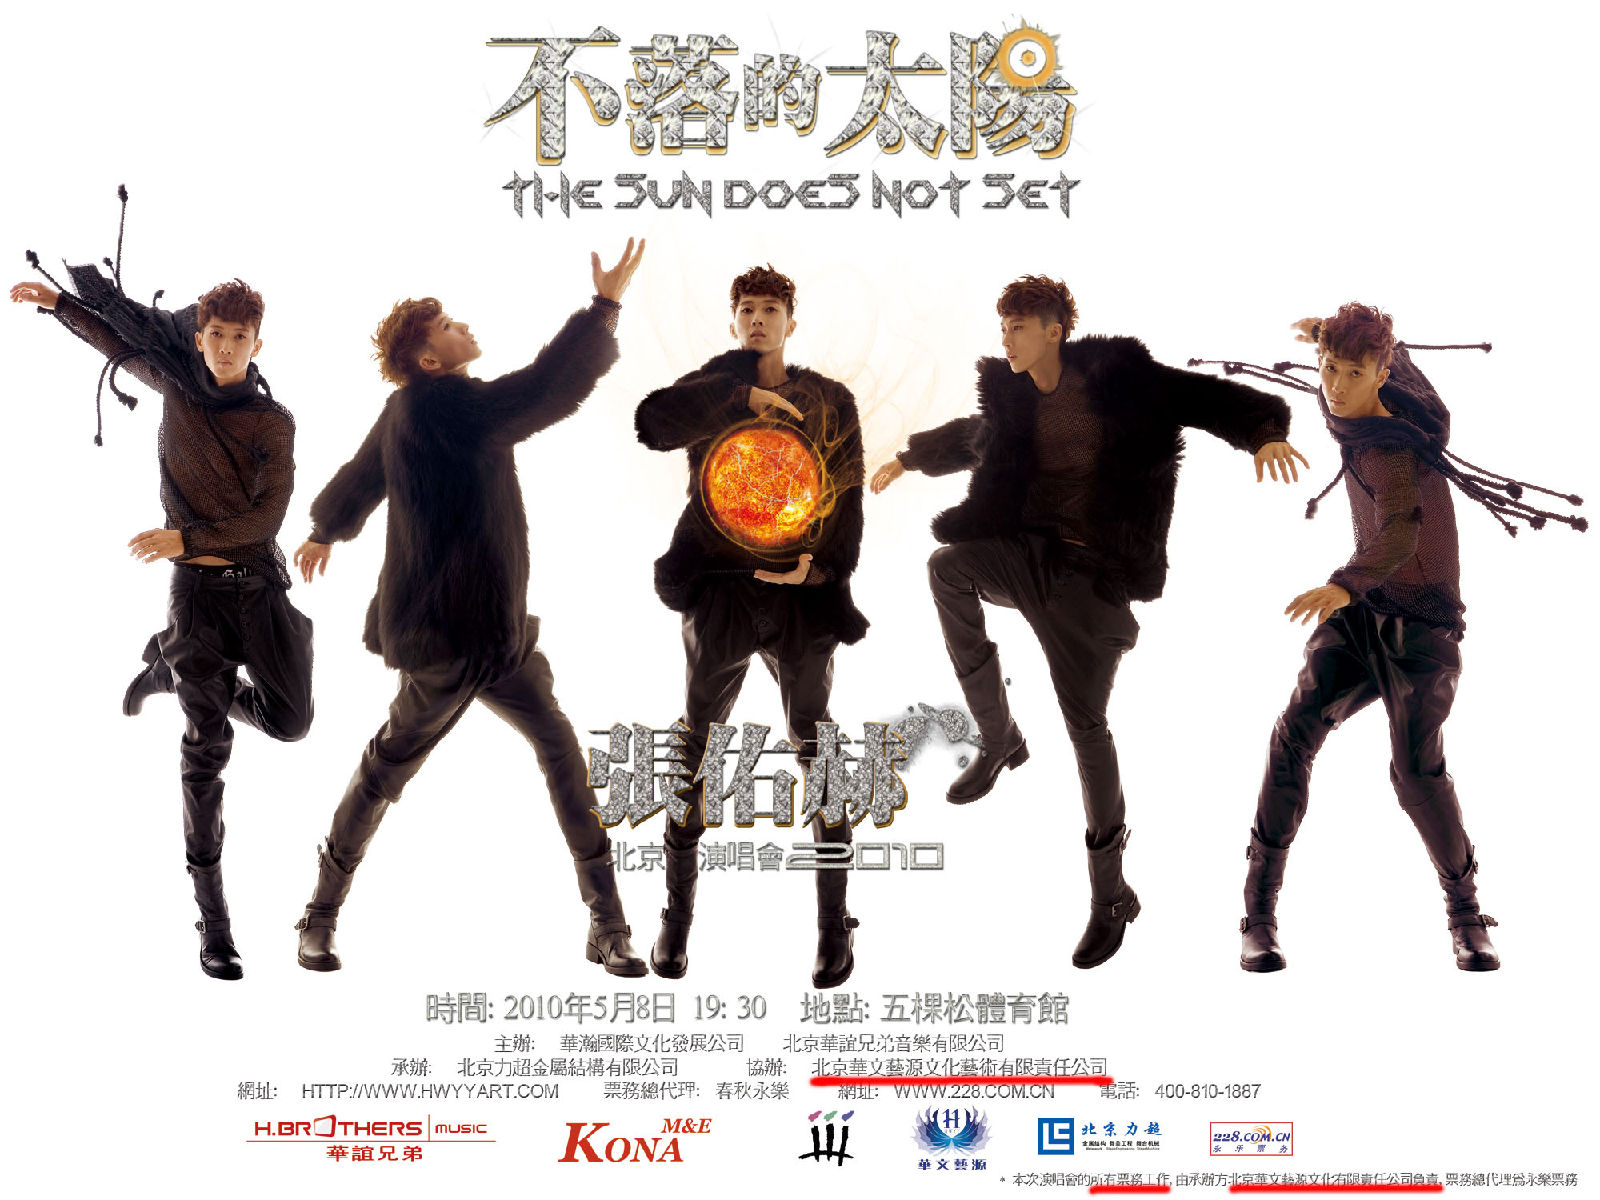 [Fotos] Beijing Concert Official Poster B2258202595a923849fb5165